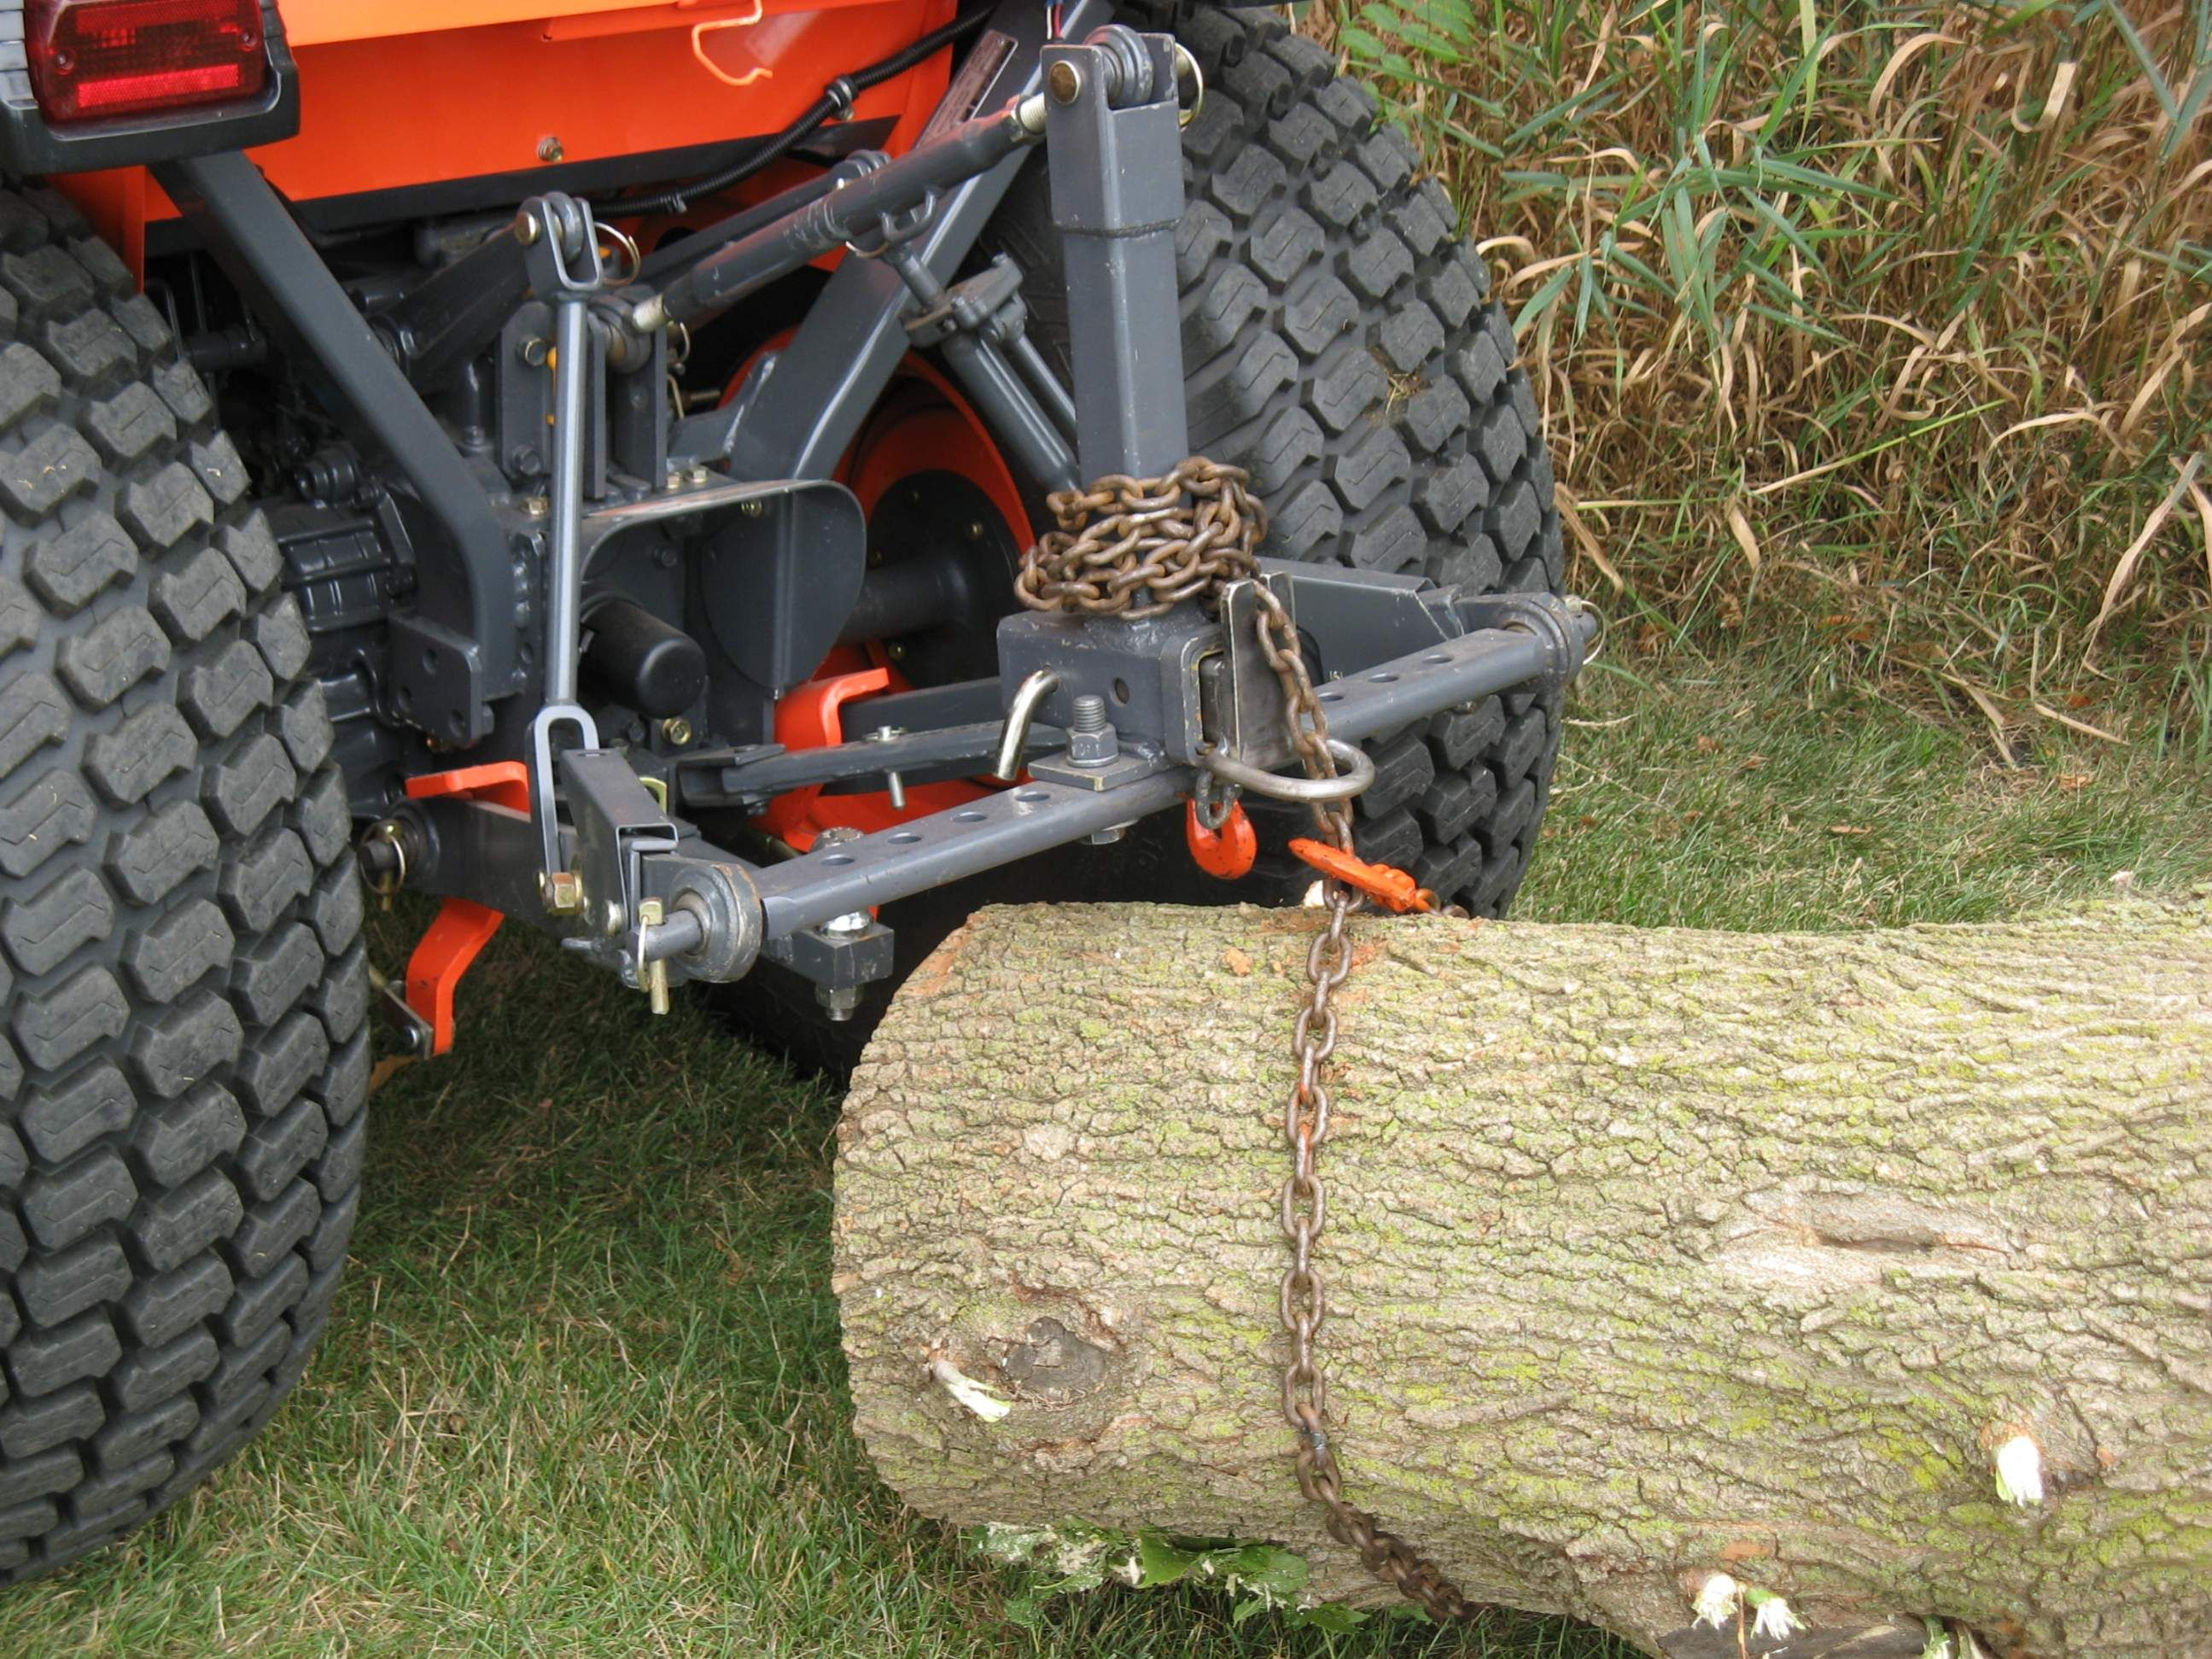 Kubota Three Point Hitch : Tractorbynet forums files kubota owning operating